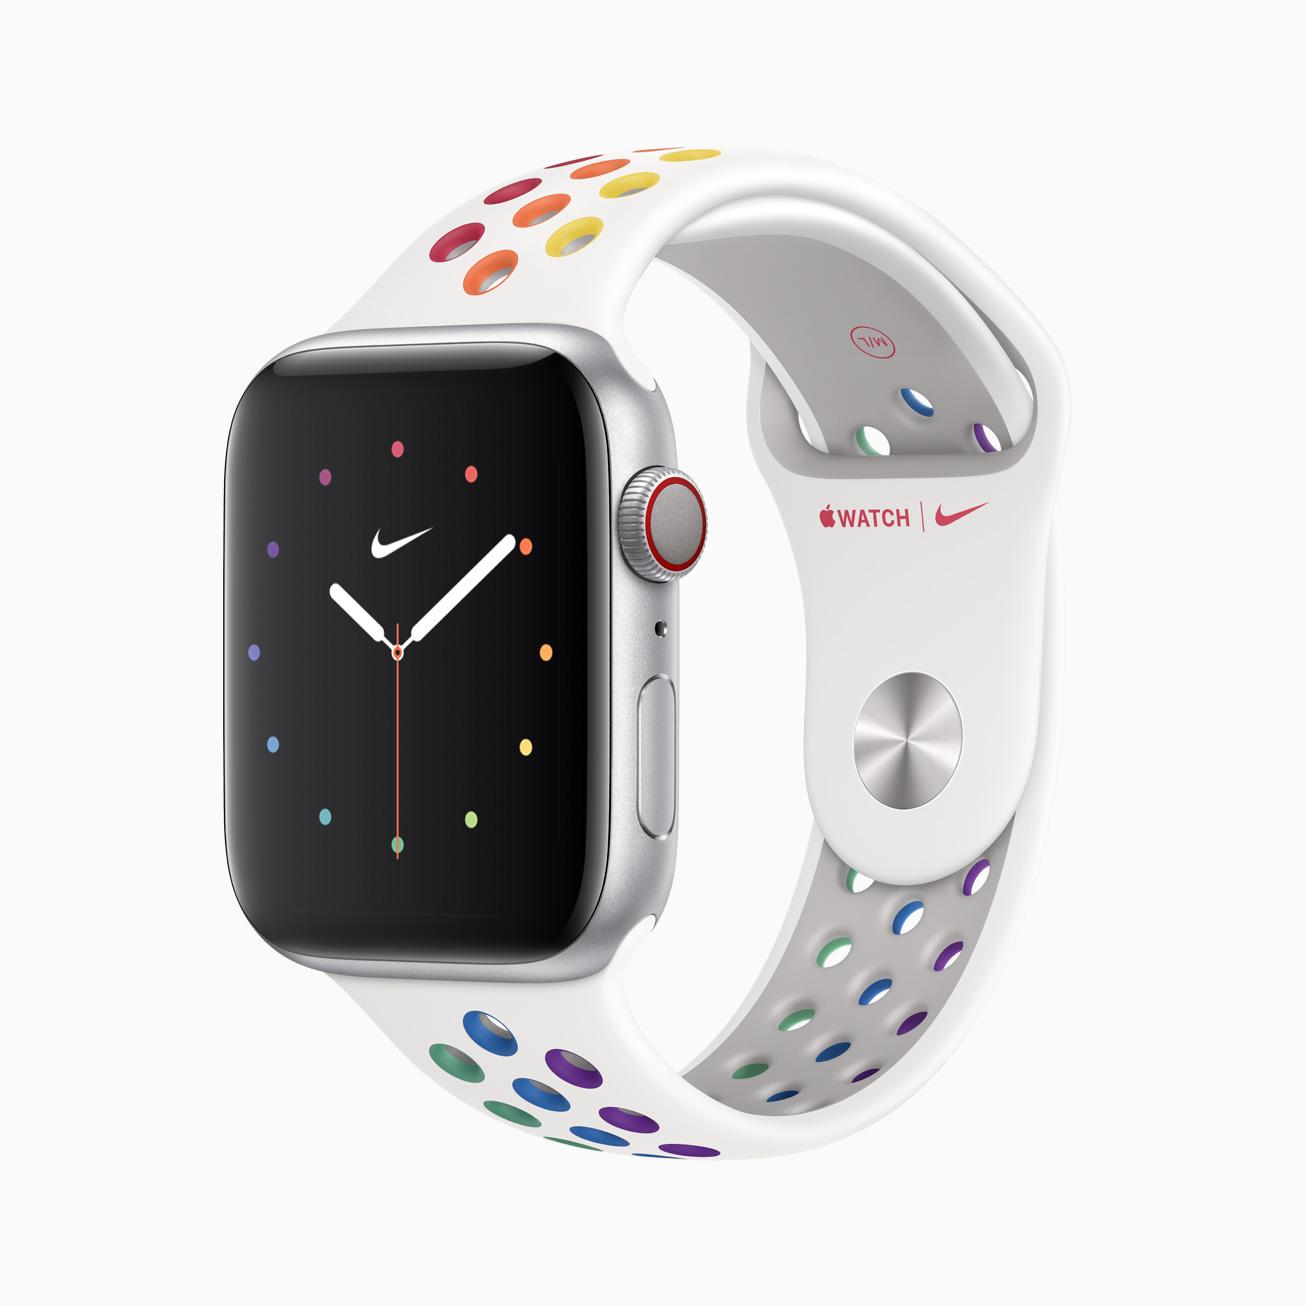 Apple_watch_s5-l-almsvr_nike-pride-ss20-watch-pride-edition_05182020